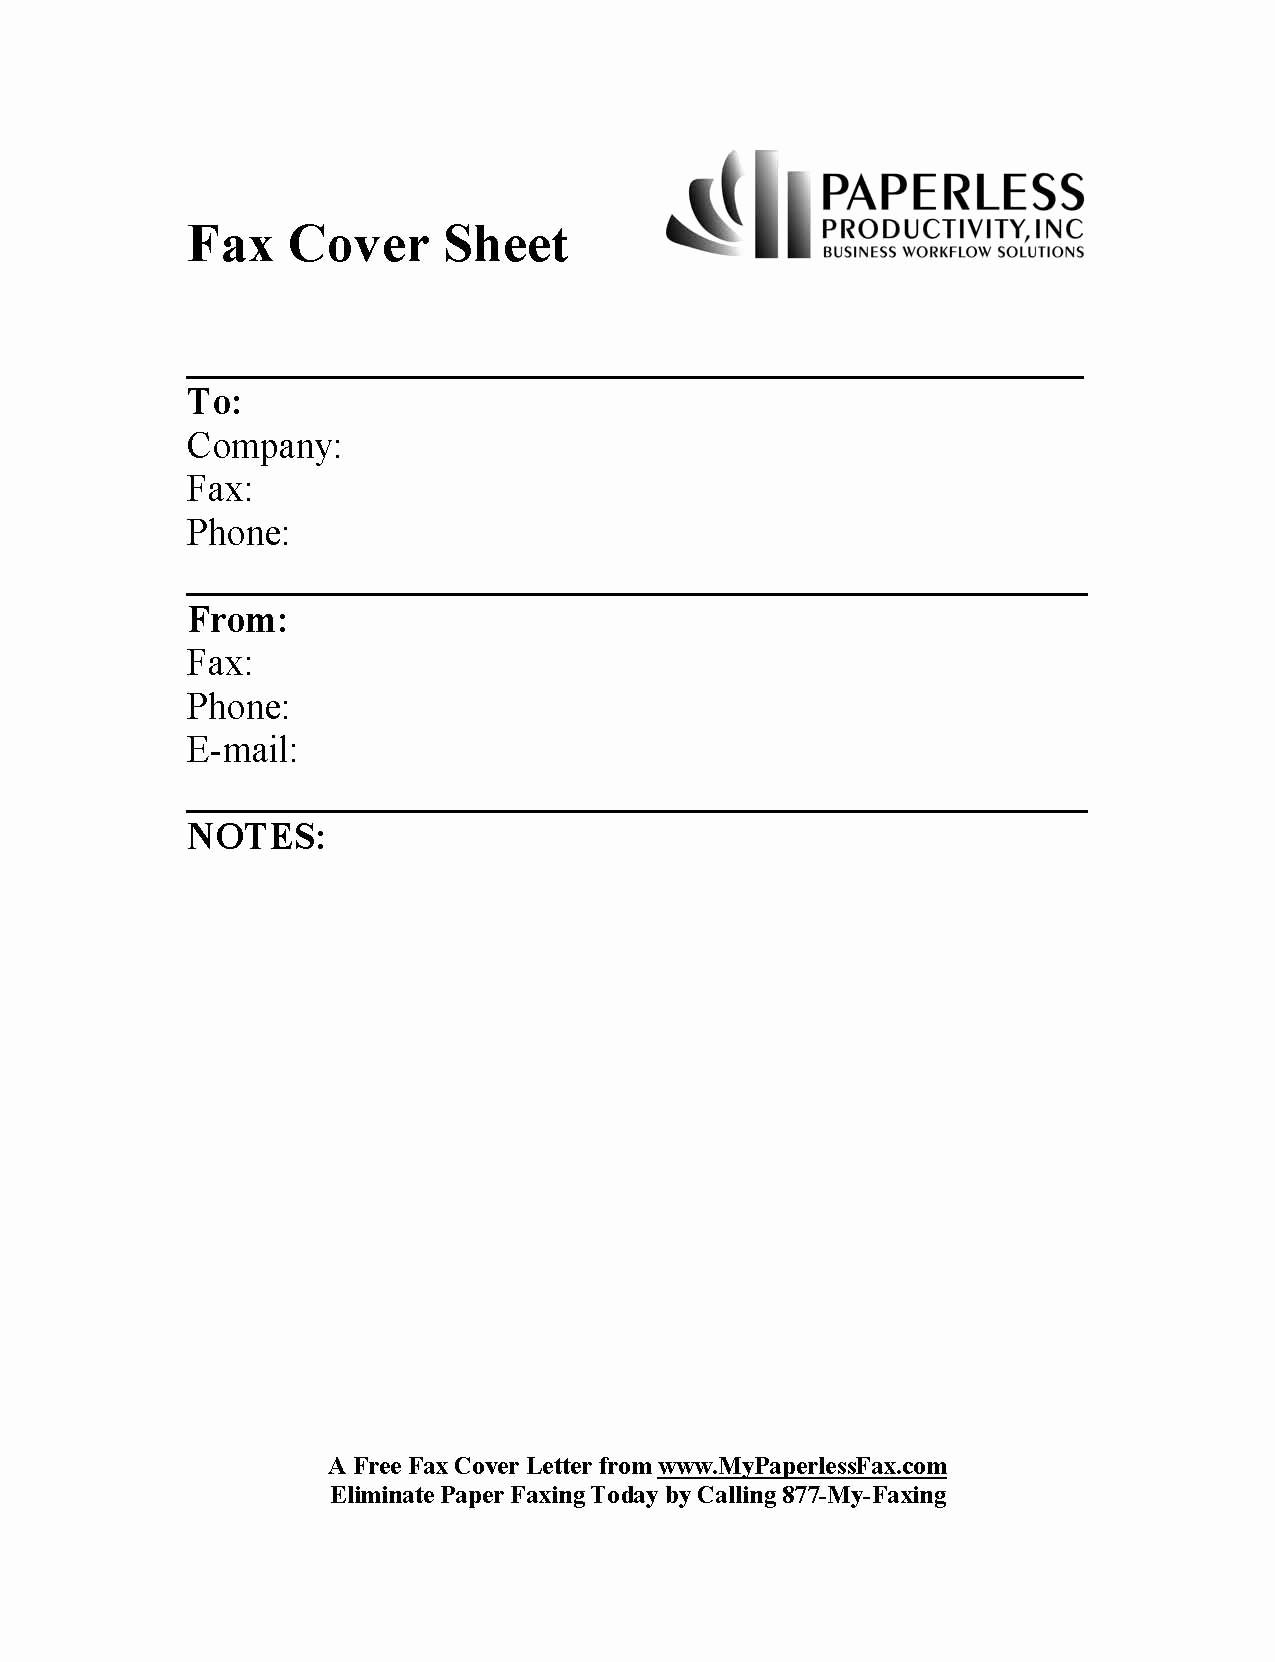 Free Fax Cover Letter Template Beautiful Microsoft Fice Fax Template Portablegasgrillweber